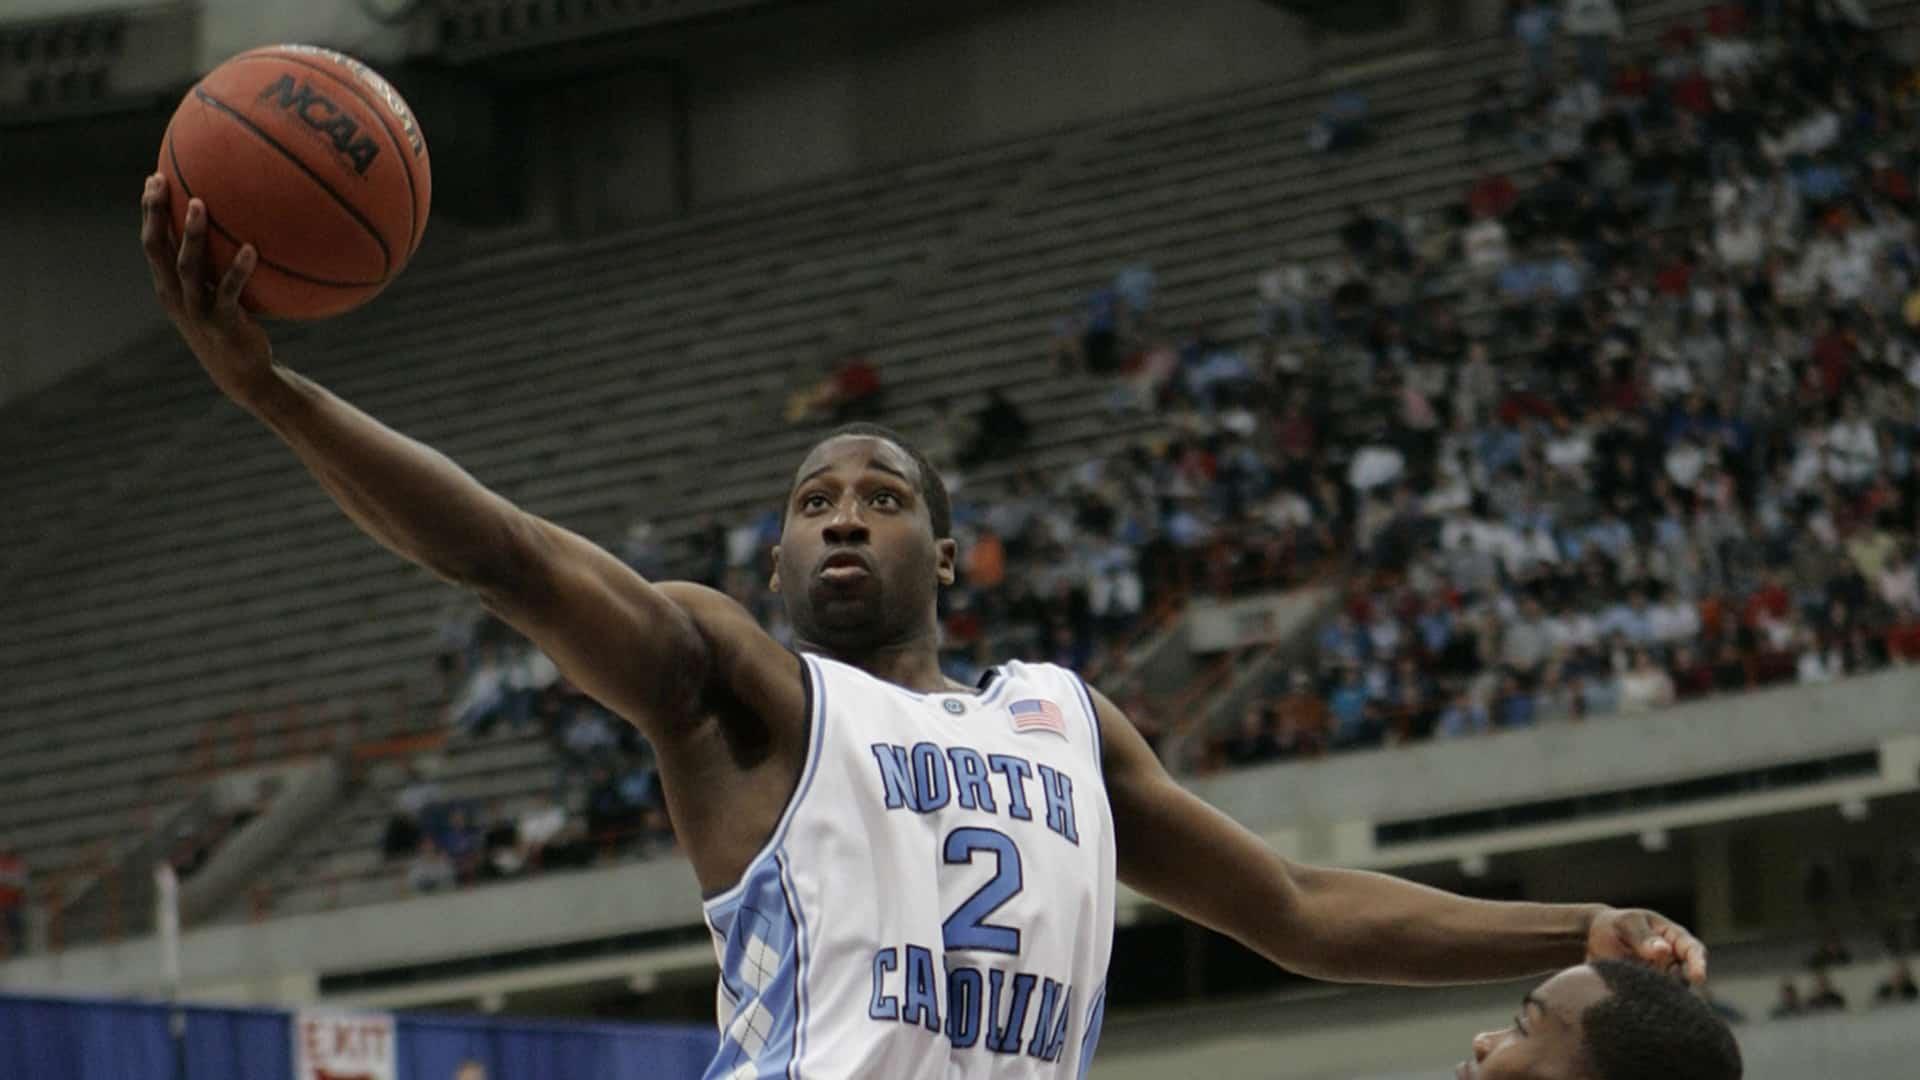 Raymond Felton Playing Basketball At UNC